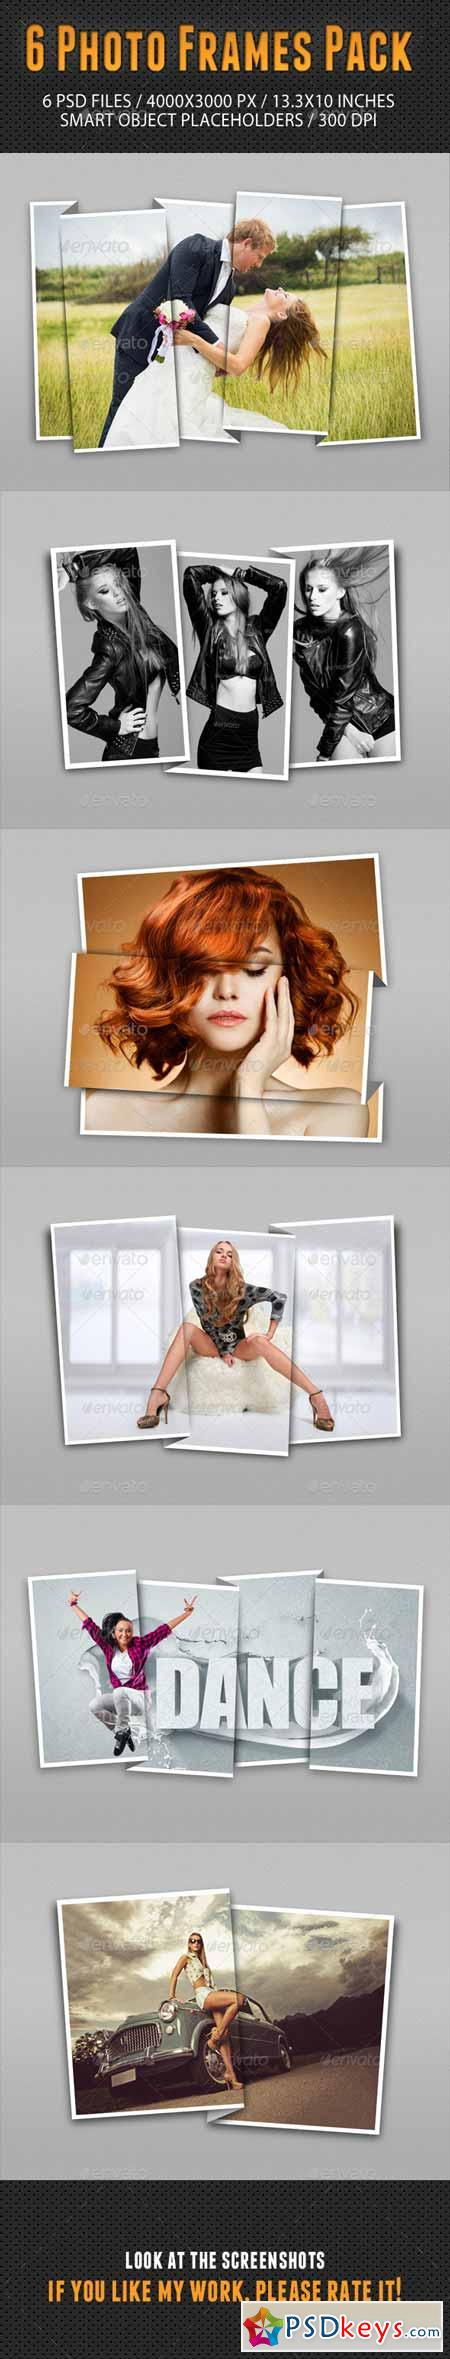 Photo Frames Pack 13 10202786